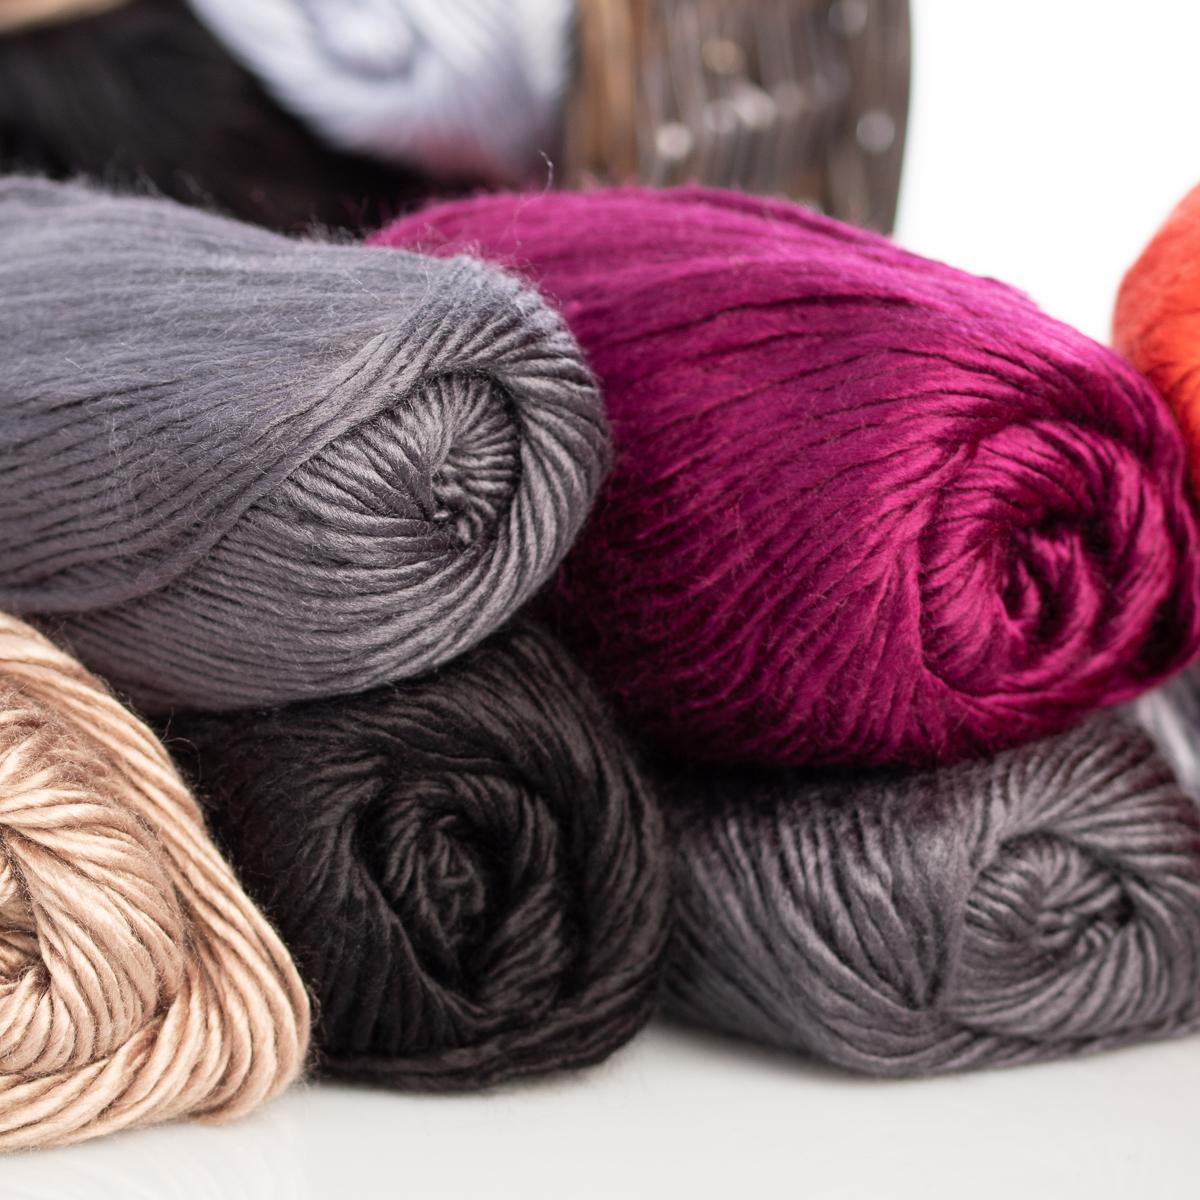 3pk-Lion-Brand-Yarn-Landscapes-Acrylic-100-Medium-4-Soft-Knitting-Crocheting thumbnail 18